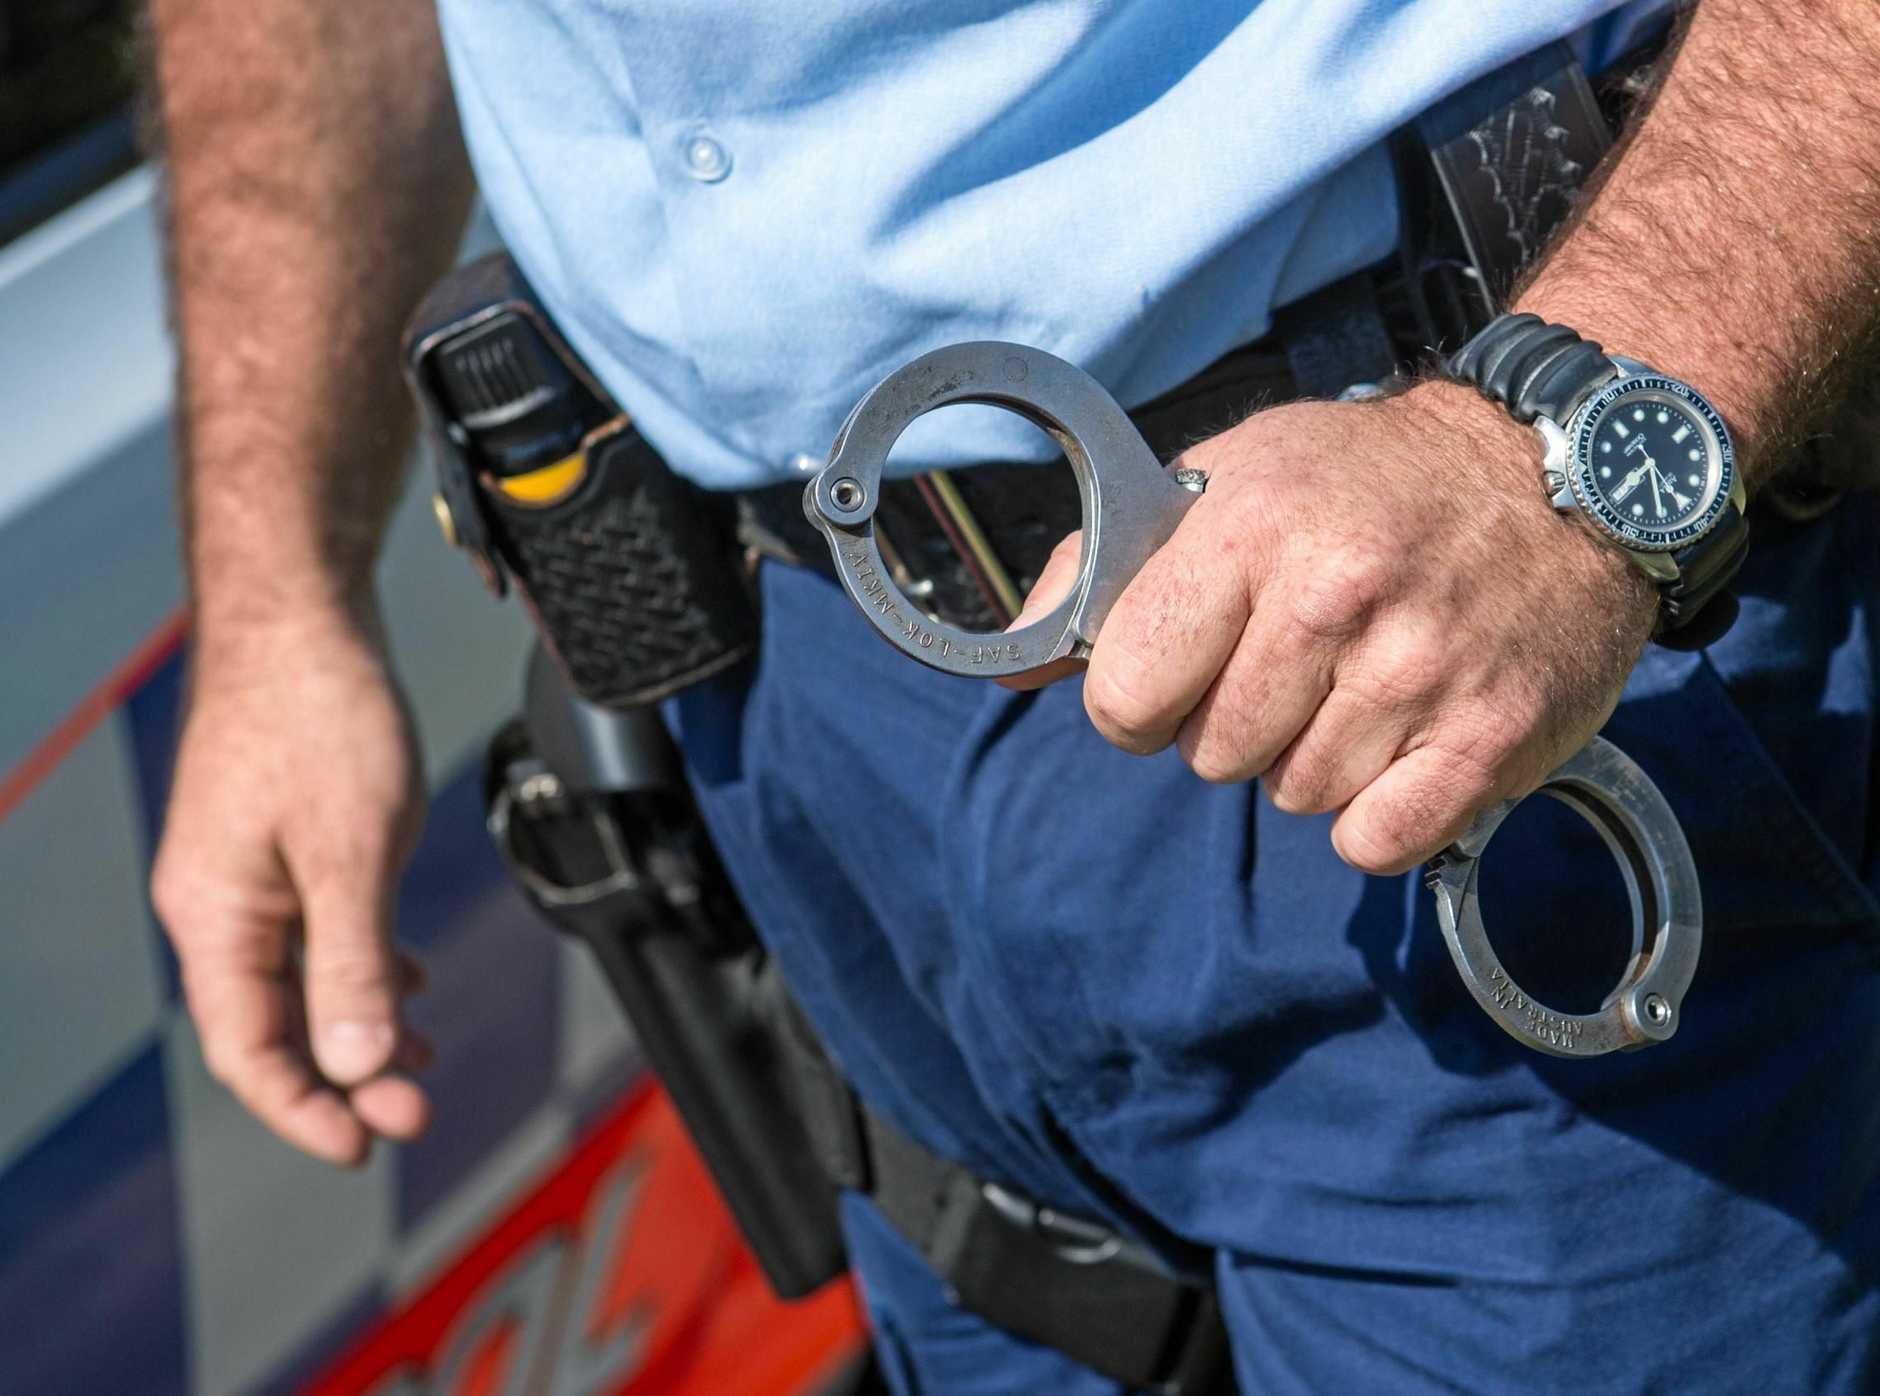 700 acid tabs nabbed at Nimbin aimed for kids, police say